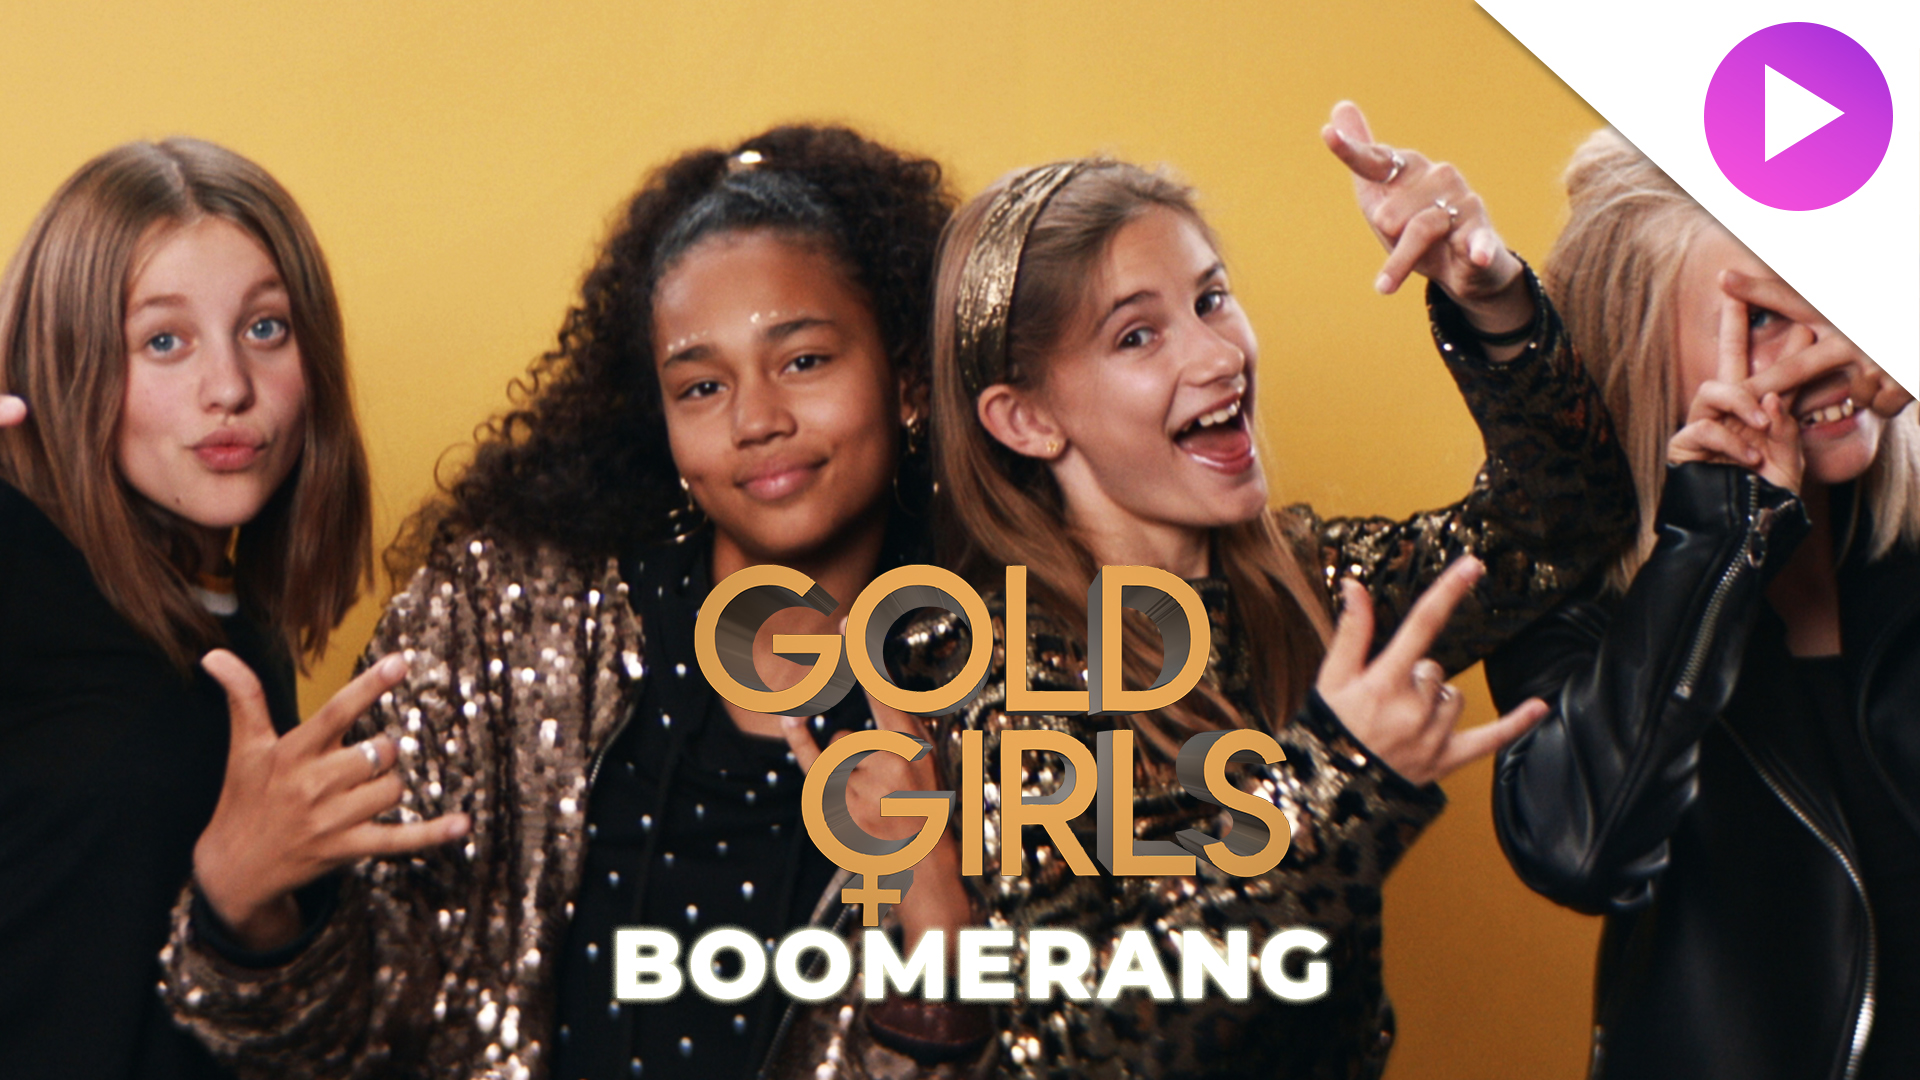 gg_boomerang_musikvideo_drupal.jpg